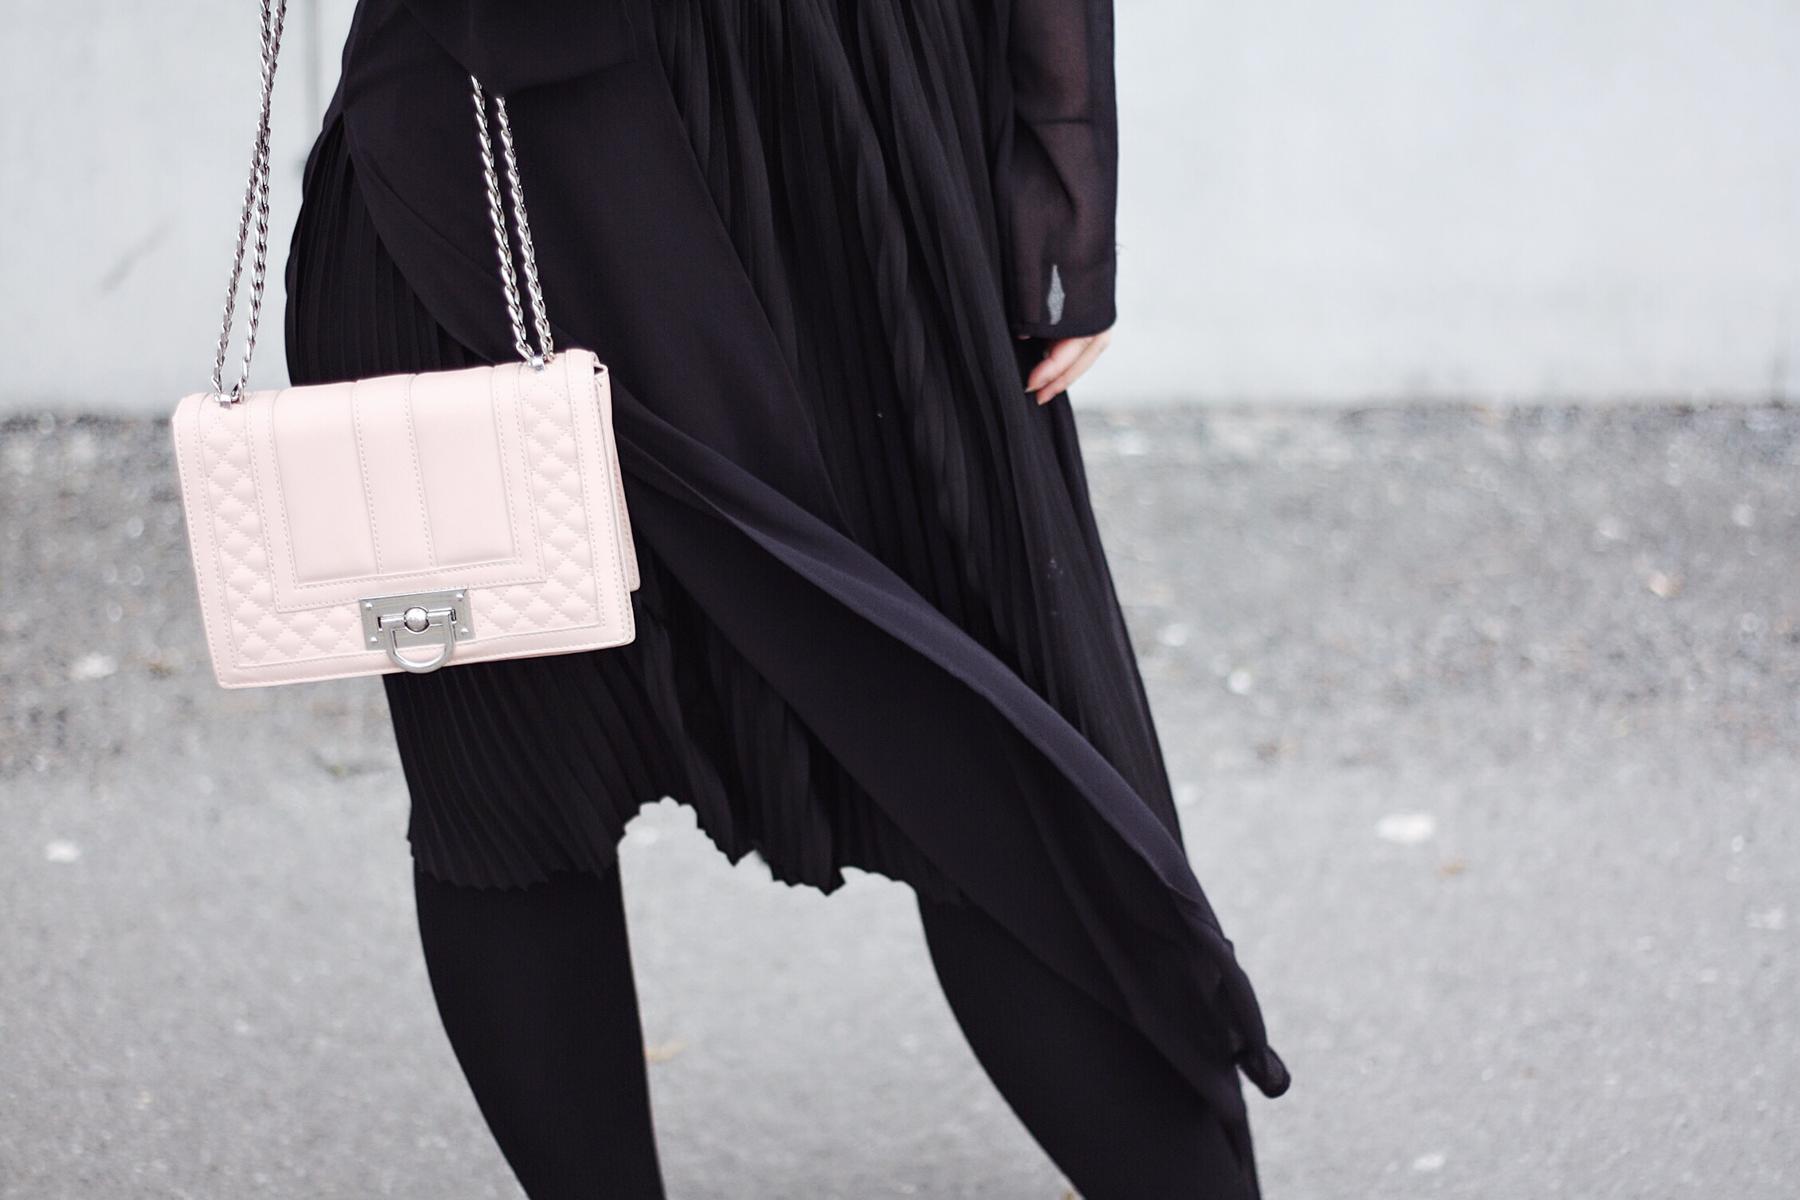 blogger_hannover_itsgoldie_velvet_bershka_ginatricot_trend_outfit_inspiration_trends_frühling_2017_michelle_rössel_influencer_style_blogger_deutschland